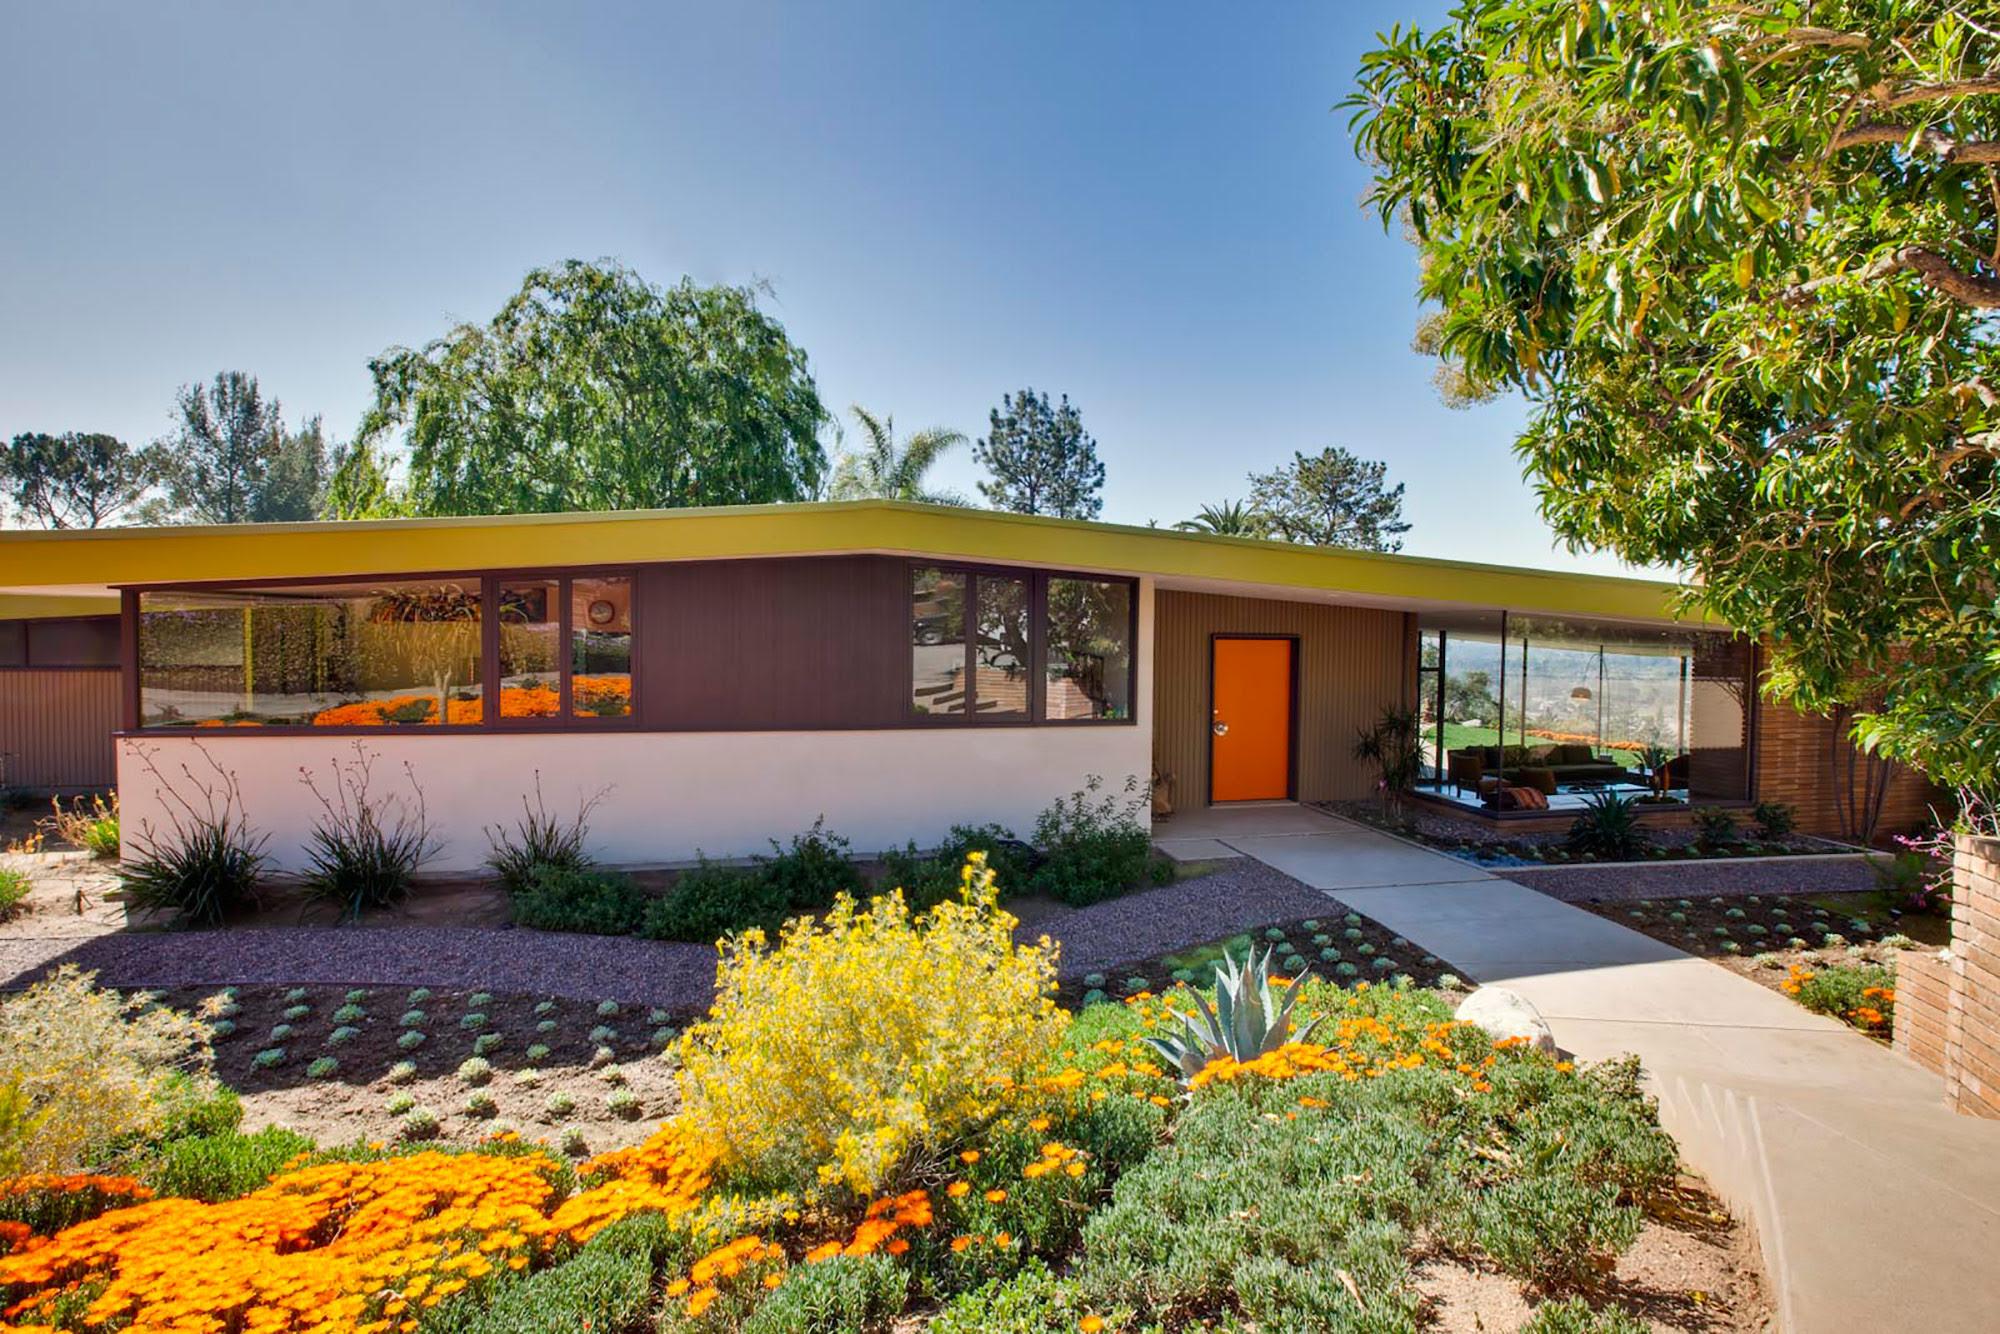 Mid Century Modern House Paint Colors - Joeryo ideas on Modern House Painting Ideas  id=28561